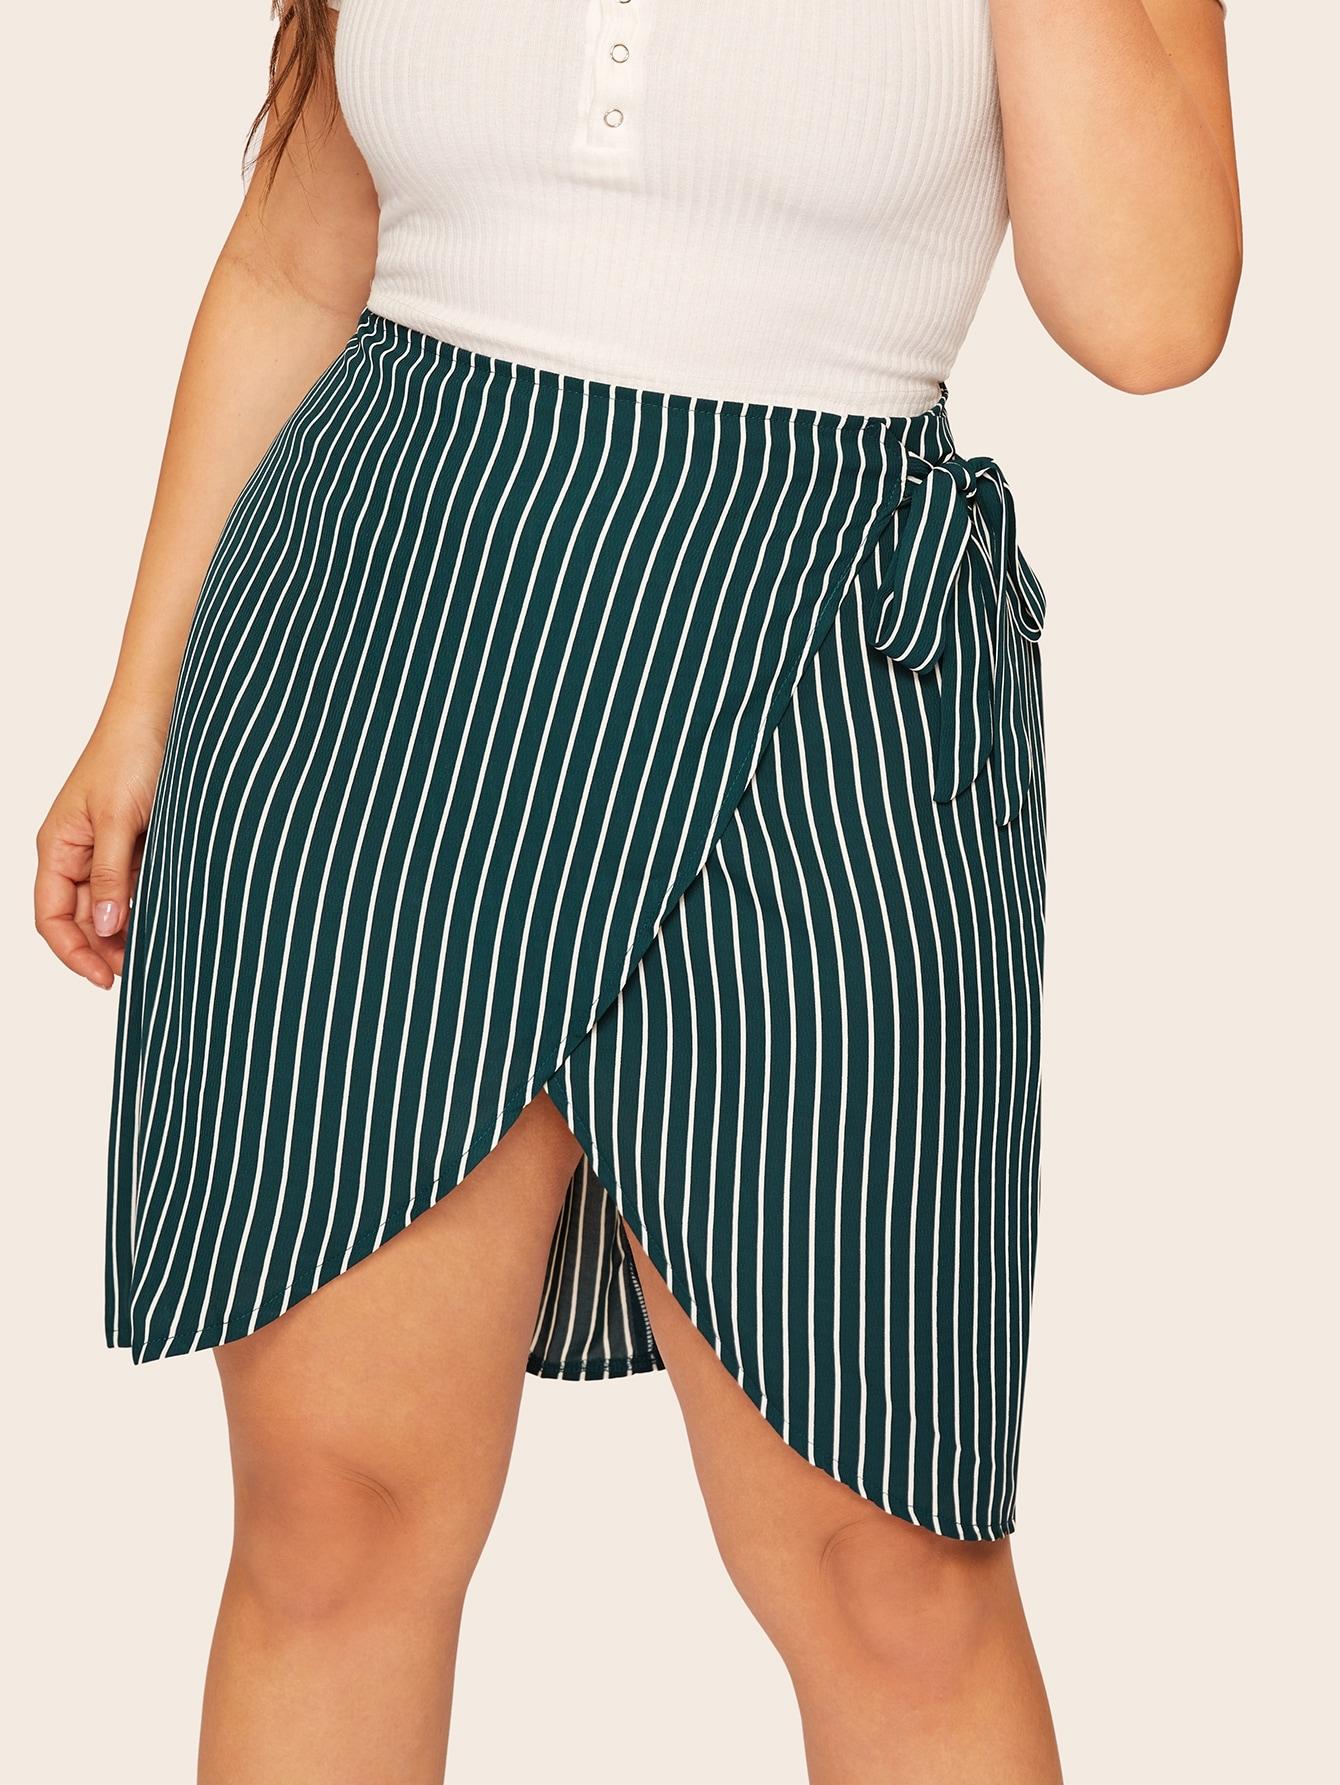 Фото - Размера плюс асимметричная полосатая юбка на запах от SheIn цвет зелёные